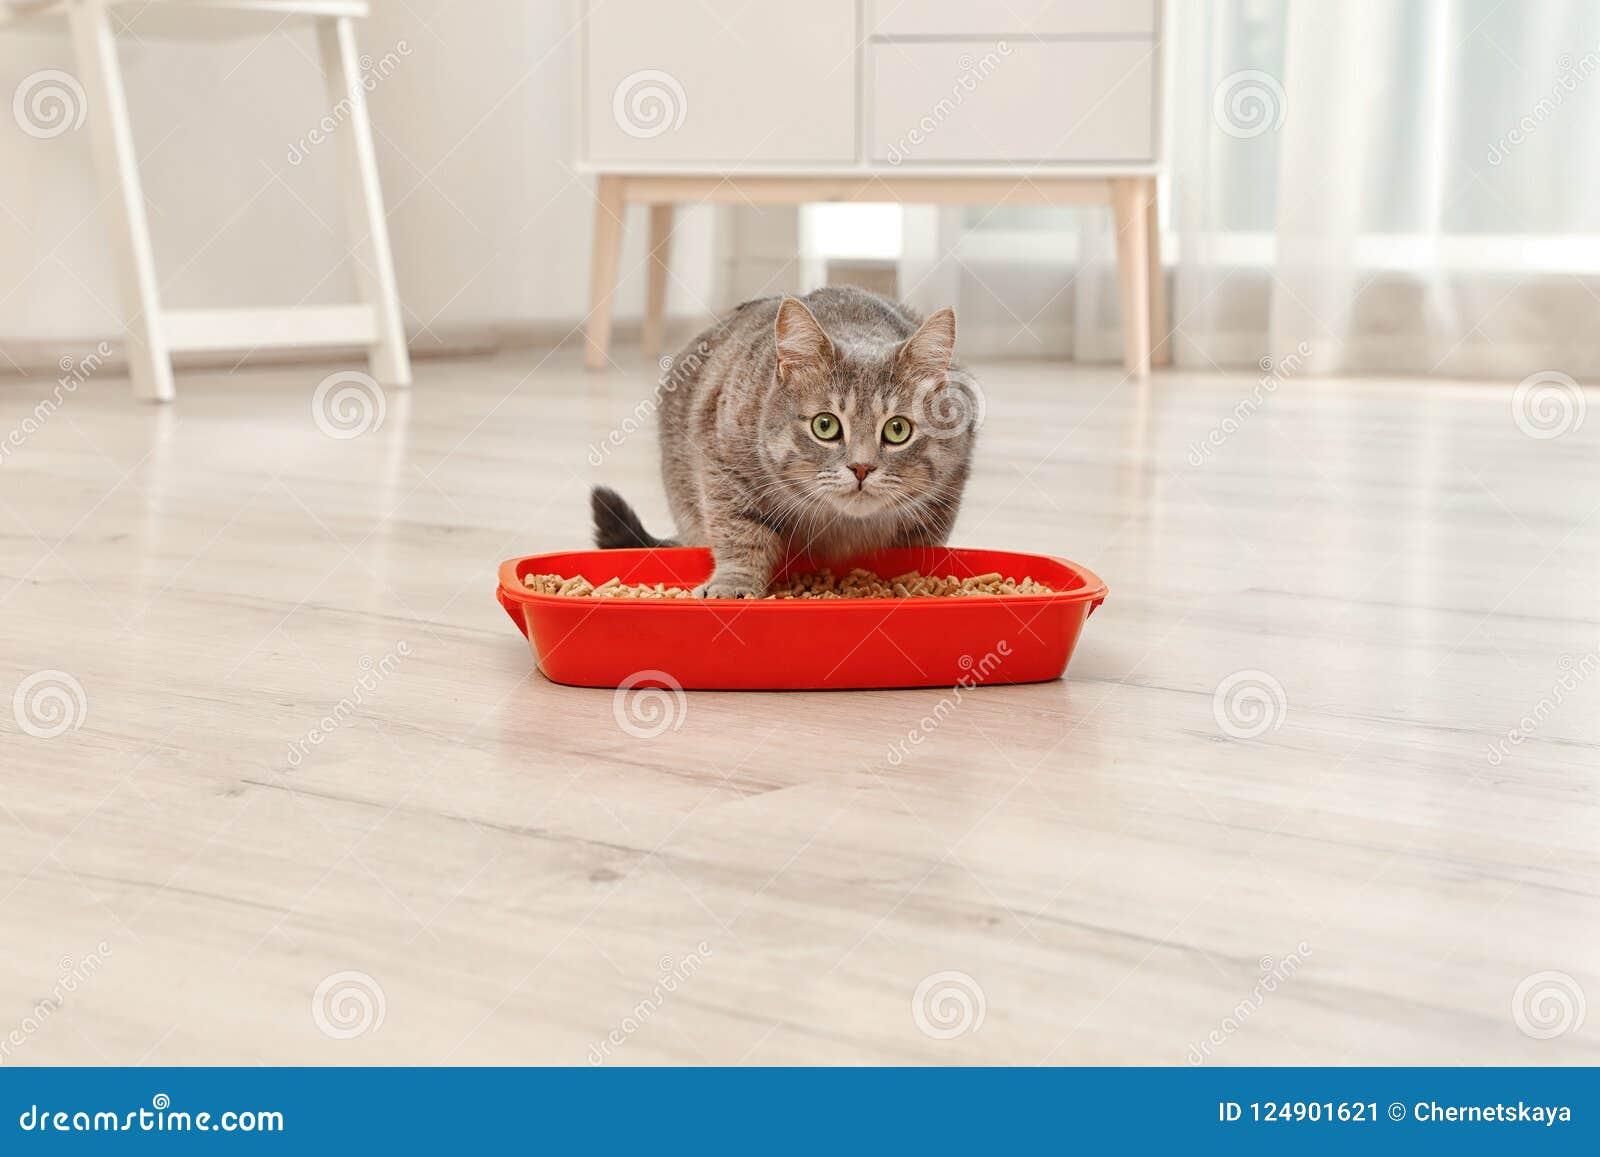 Adorable grey cat near litter box indoors